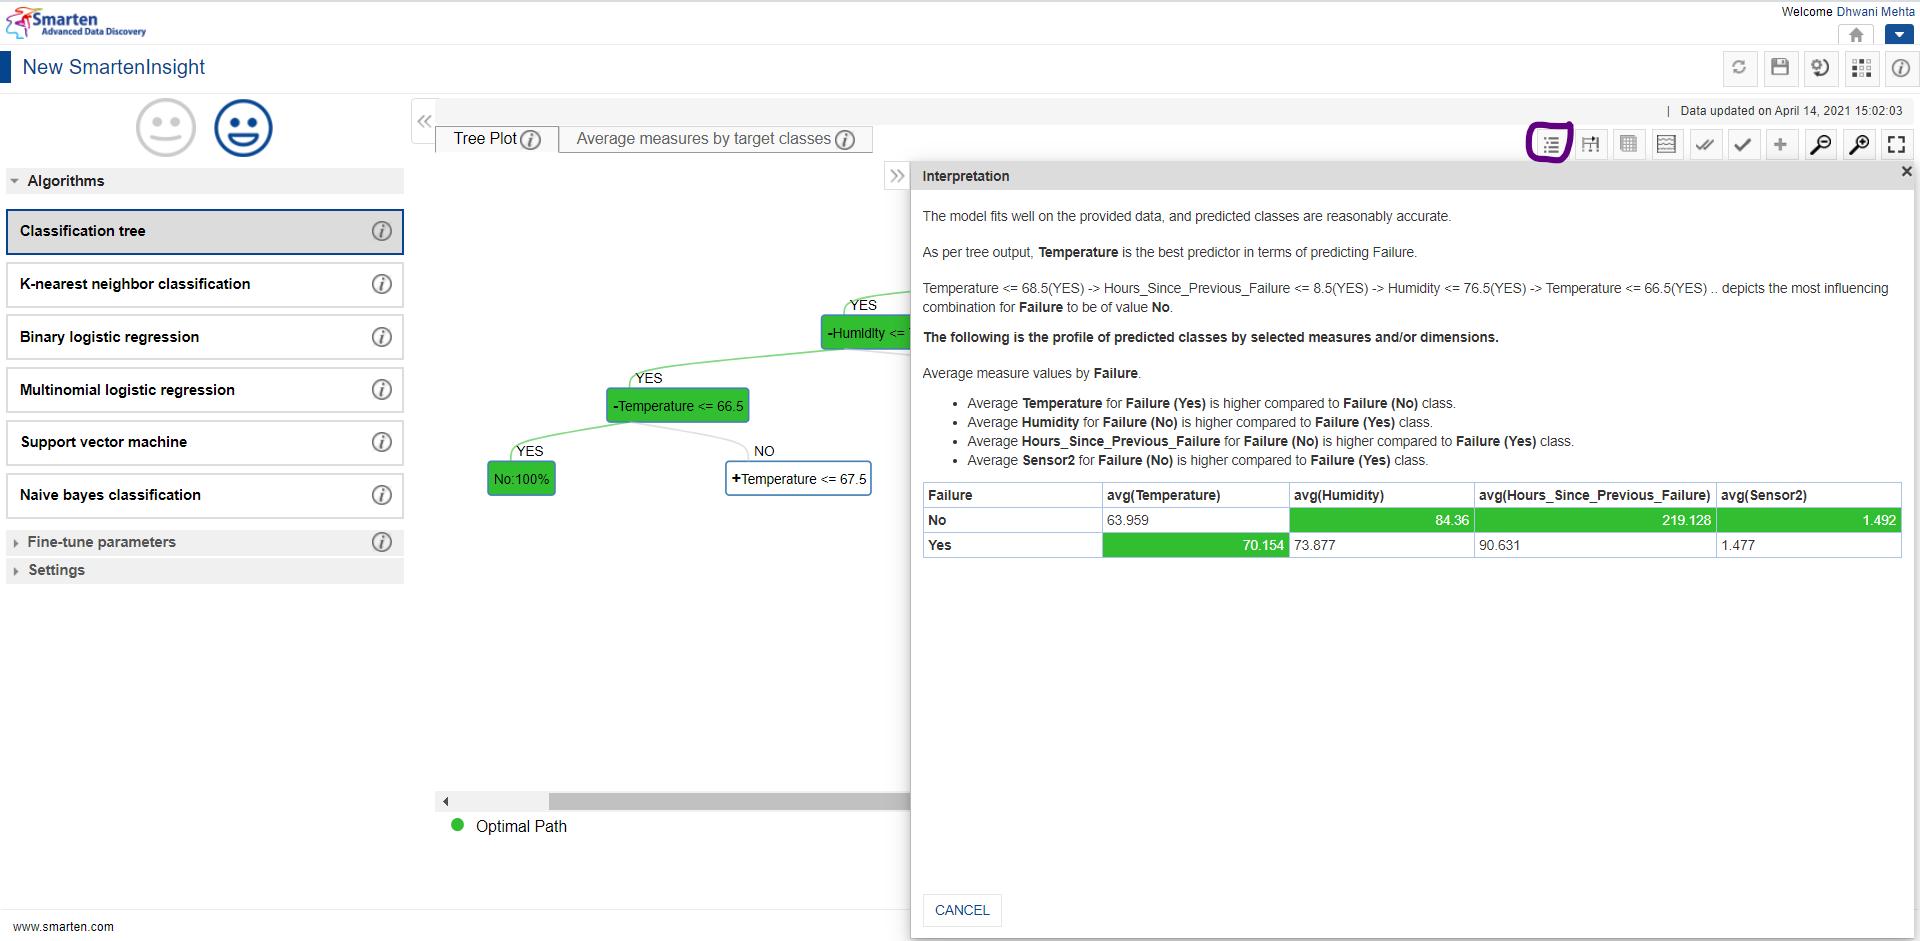 classification-tree-algorithm-interpretation-for-machine-maintenance-dataset